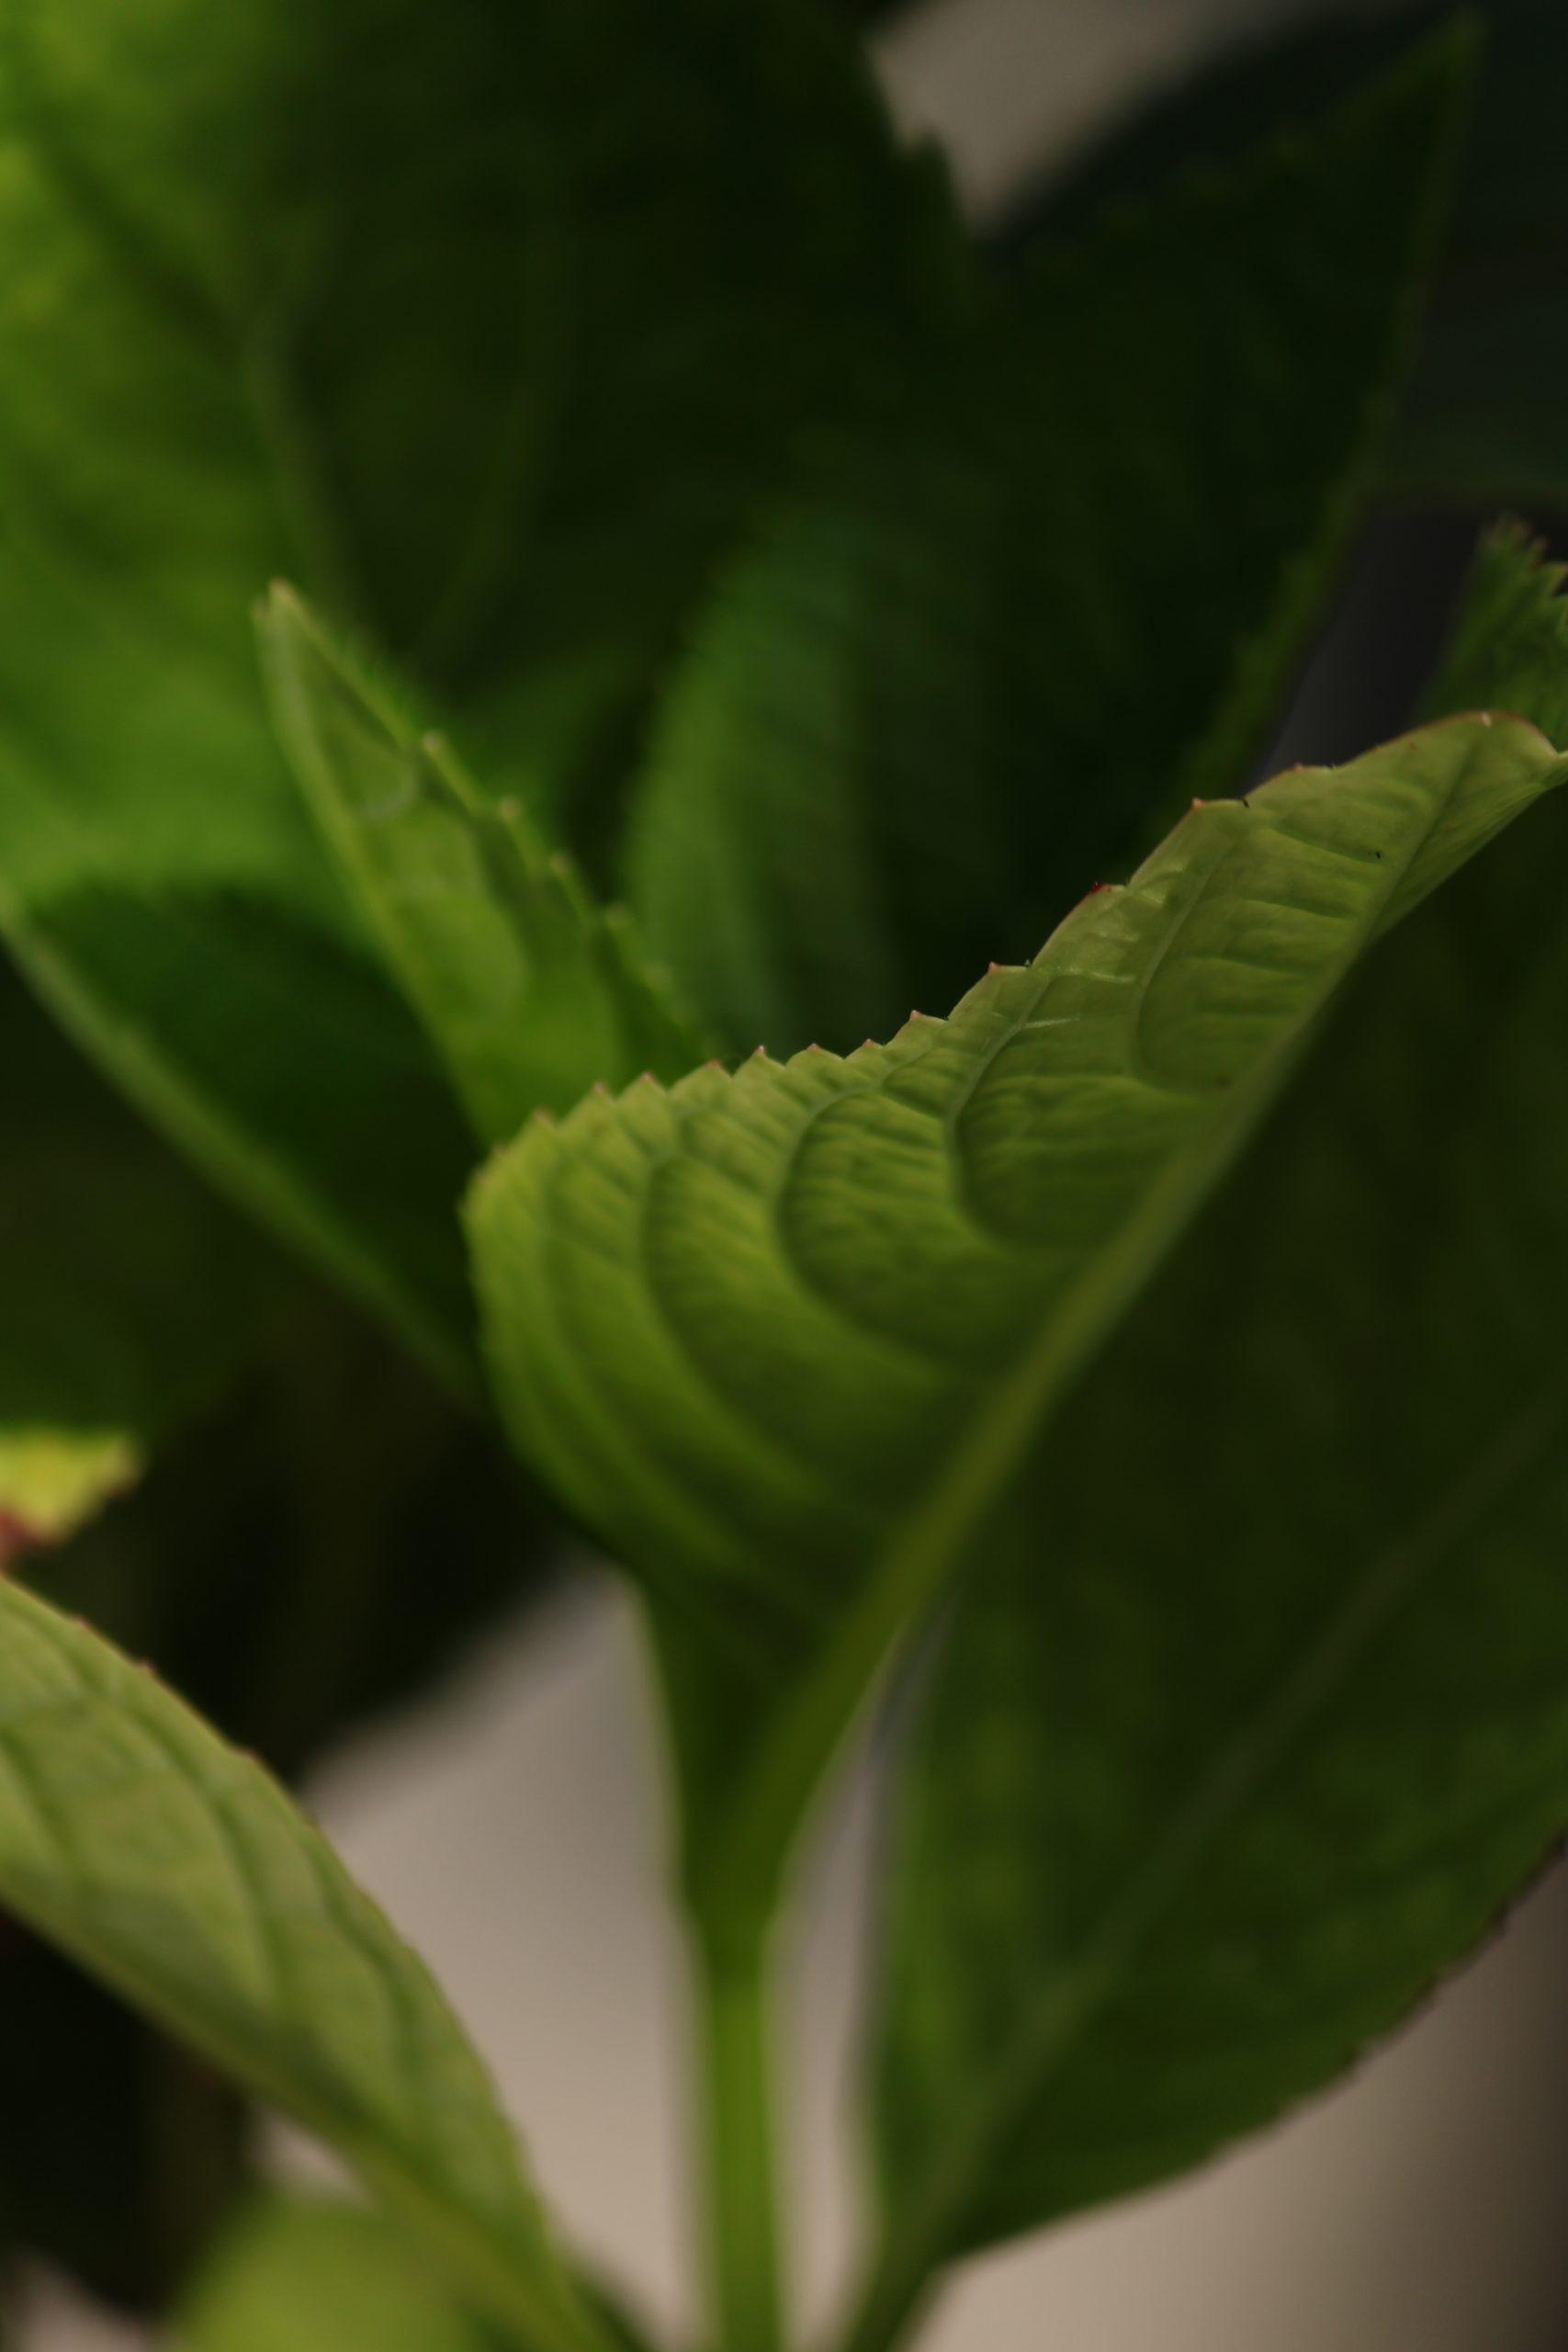 Macro view of Plant leaf